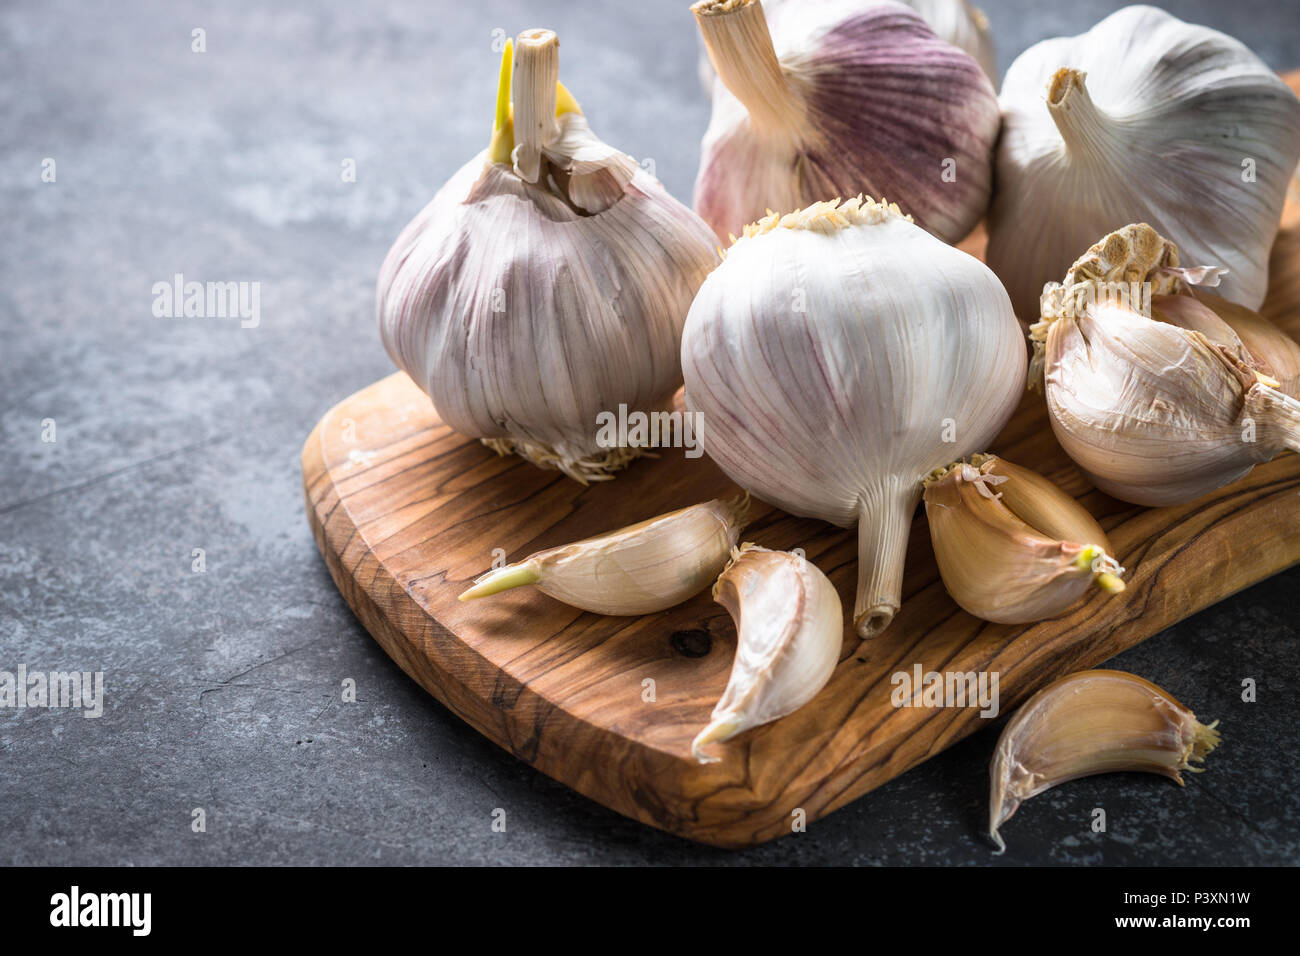 Garlic cloves on a dark stone background. - Stock Image